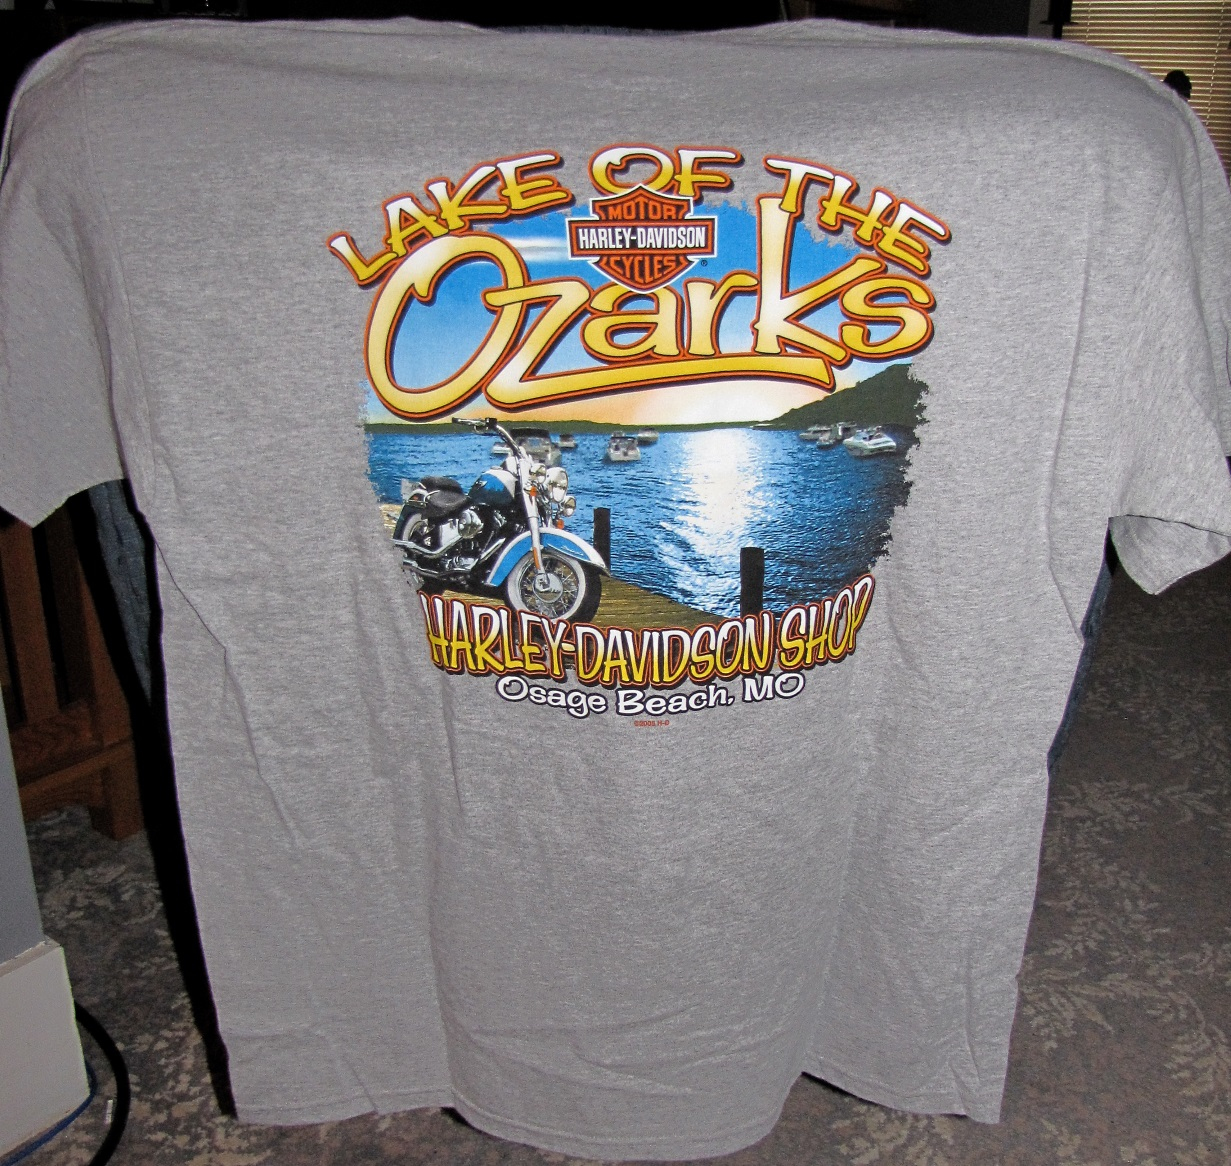 HD-25 Lake Of The Ozarks Harley Davidson Bikefest 2014 T-Shirt 2XL